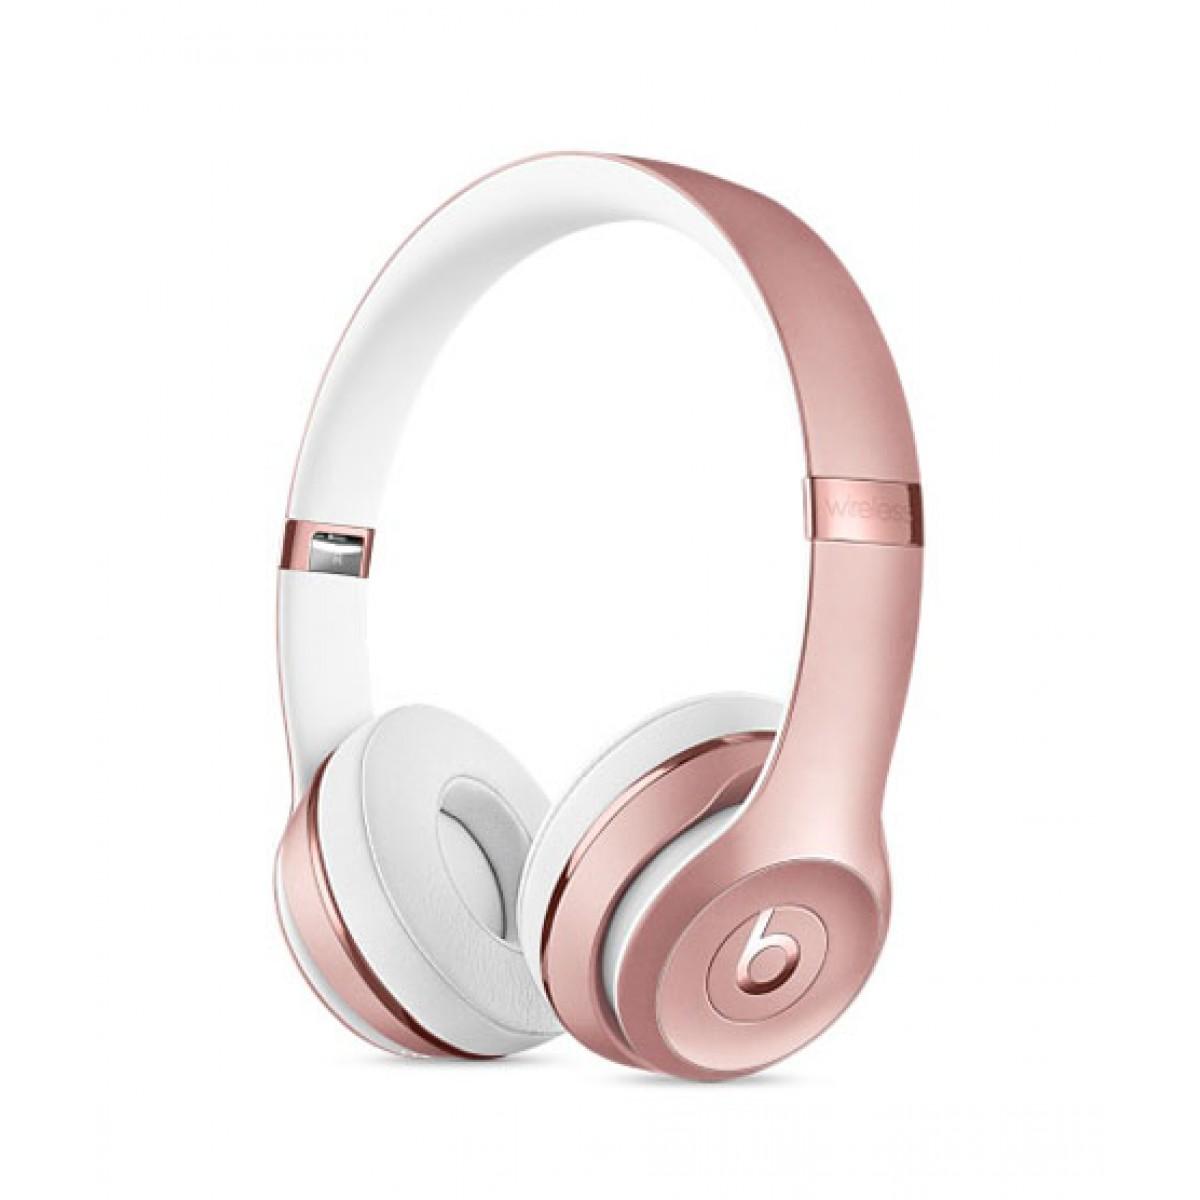 Beats Solo 3 Wireless On Ear Headphones Price In Pakistan Buy Beats Bluetooth Headphones Rose Gold Ishopping Pk